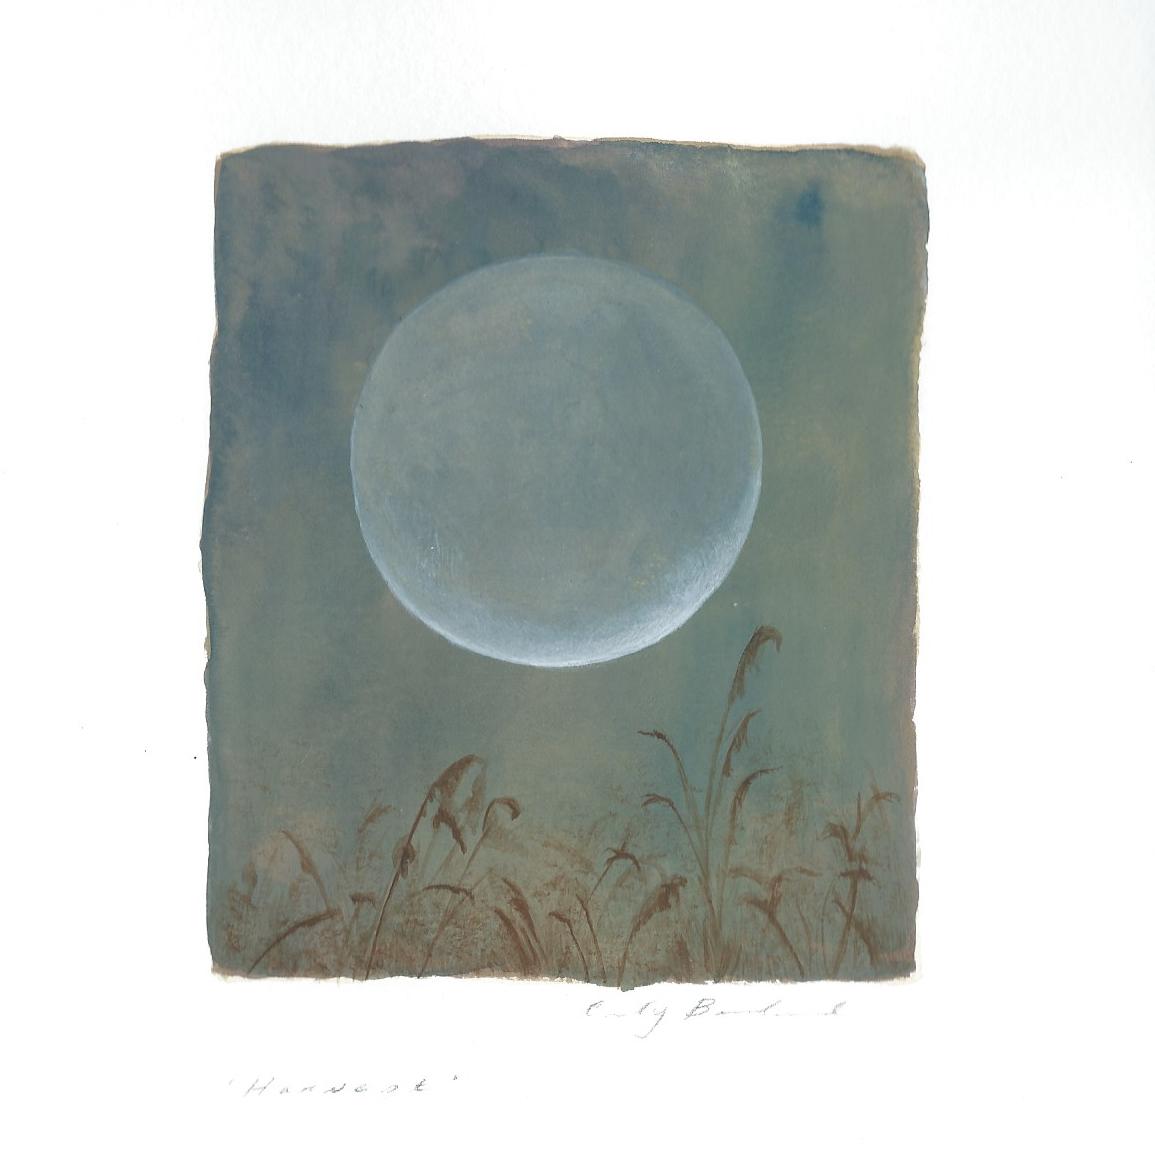 """Harvest,"" 2015, gouache on paper, 6x6 in."